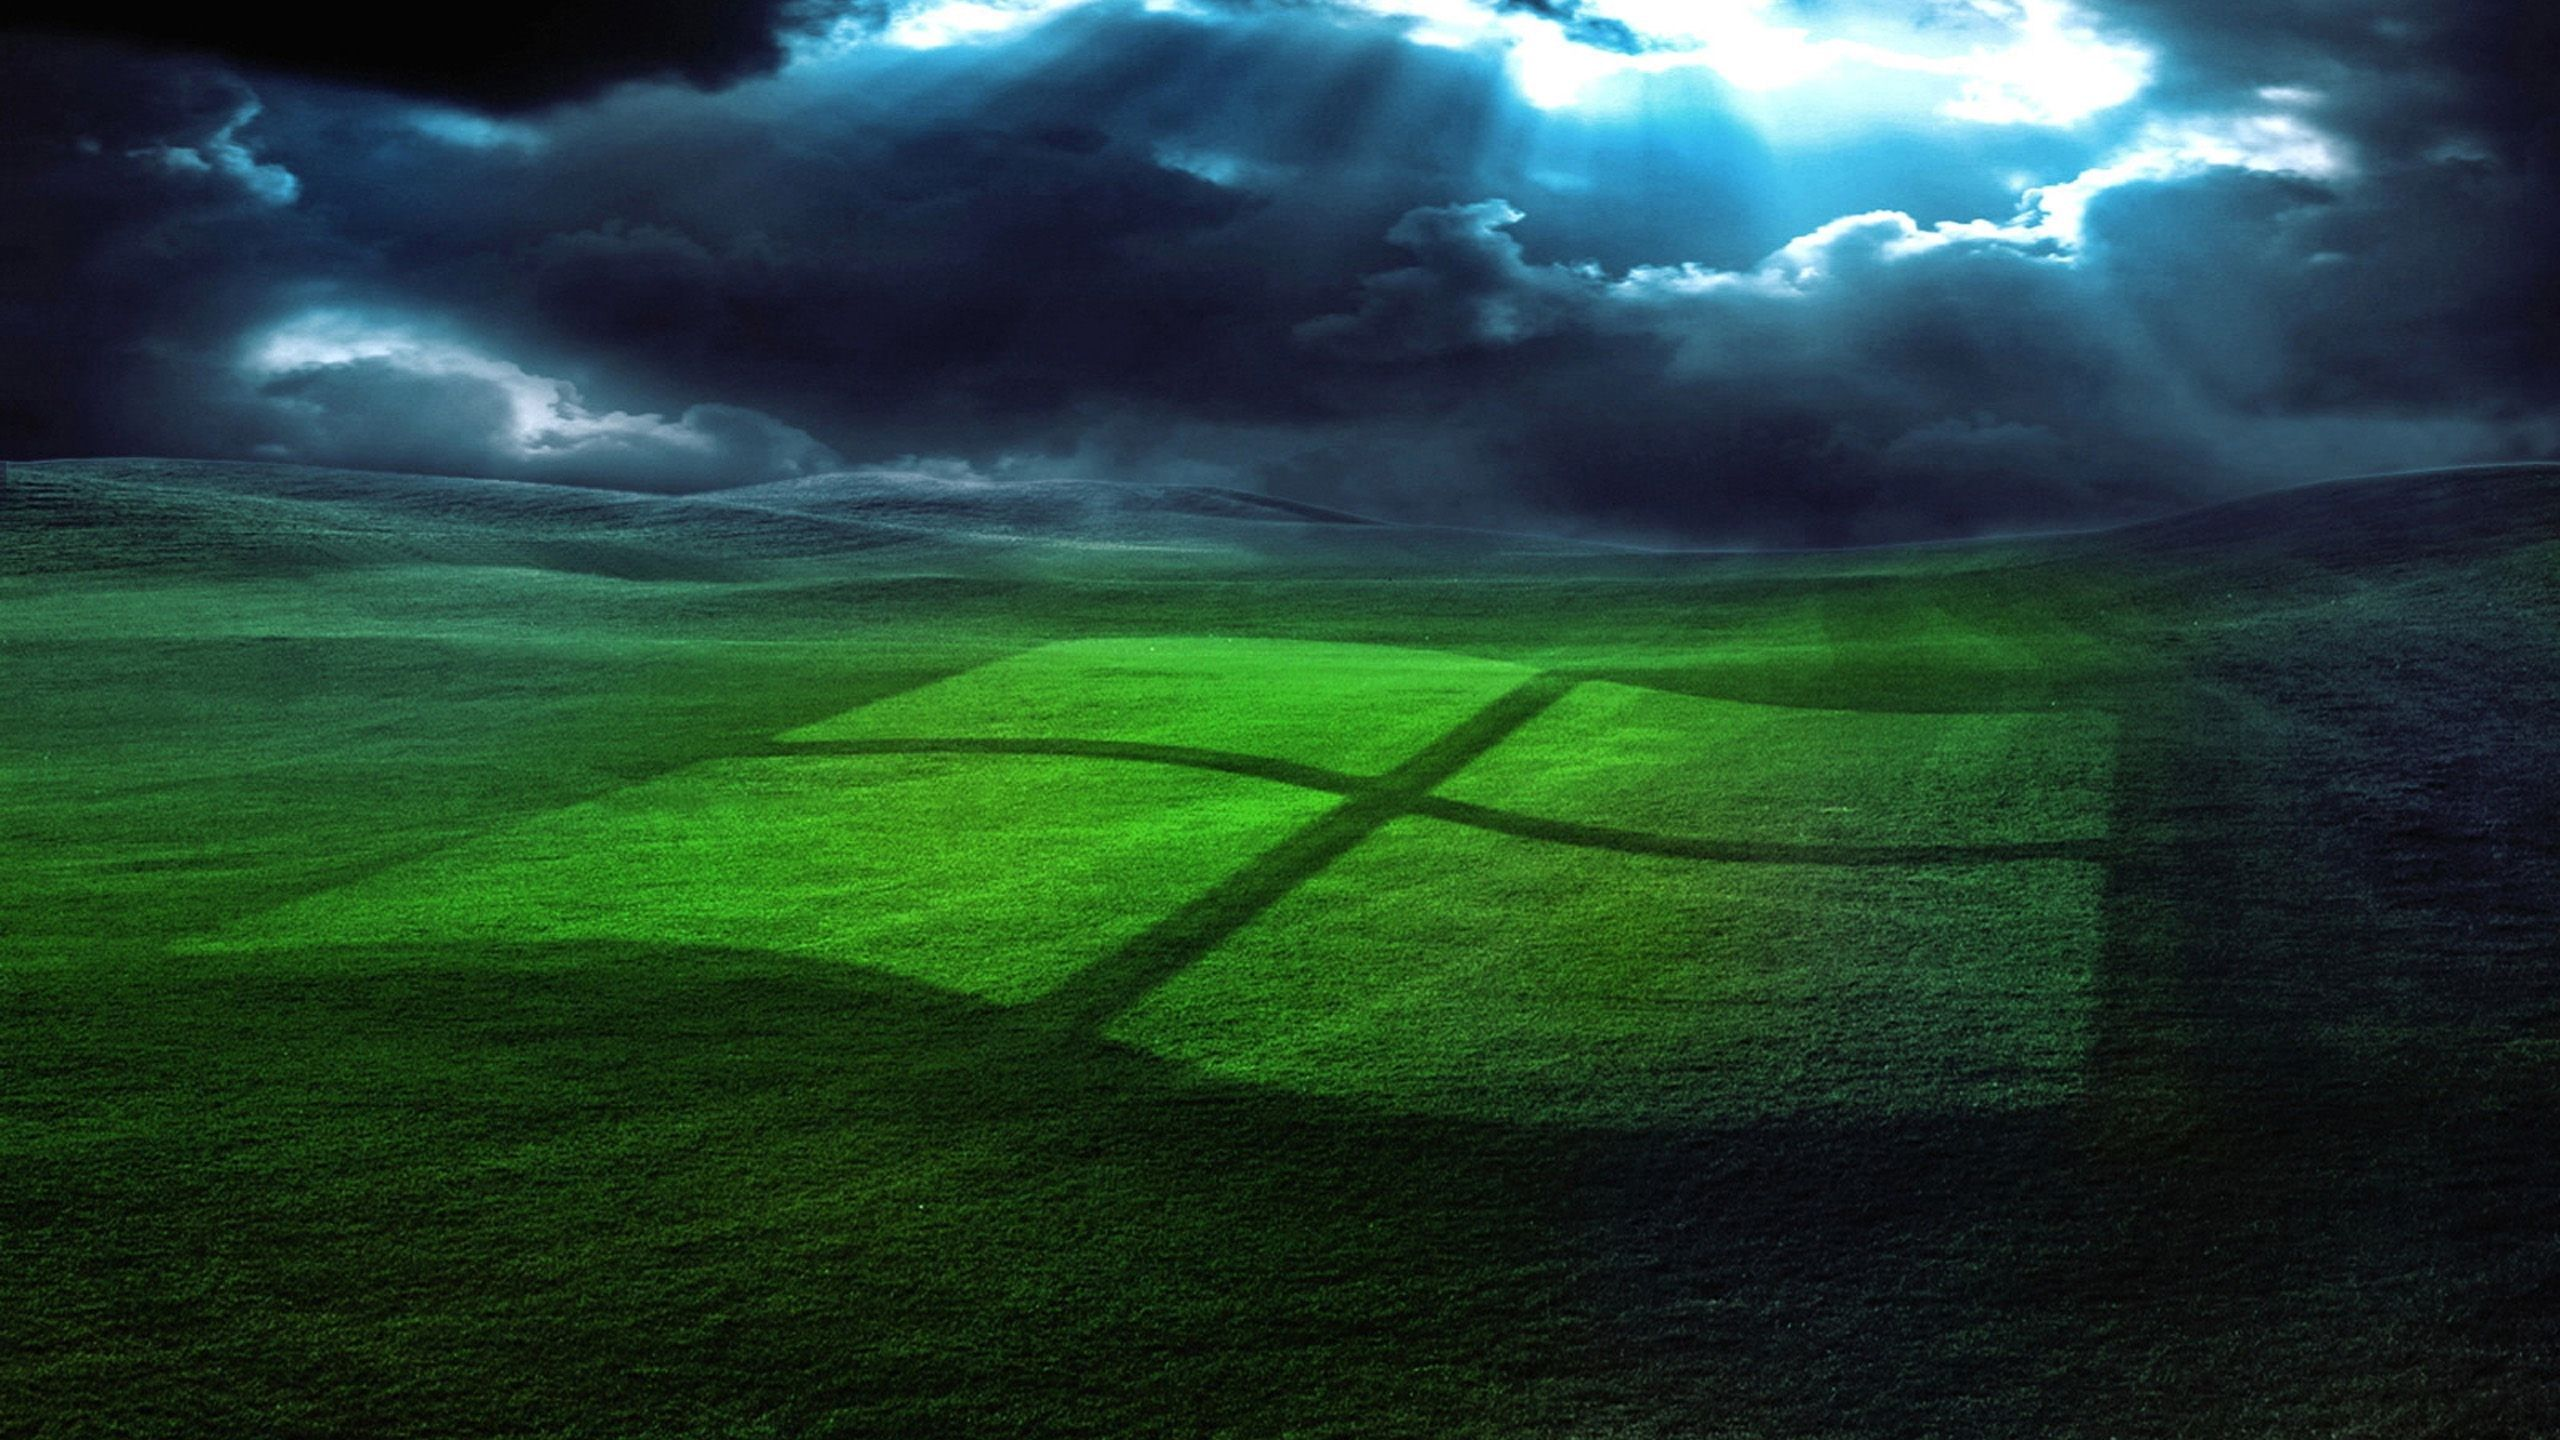 Live Wallpapers For Windows Xp Free Download Windows Wallpaper Free Desktop Wallpaper Backgrounds Desktop